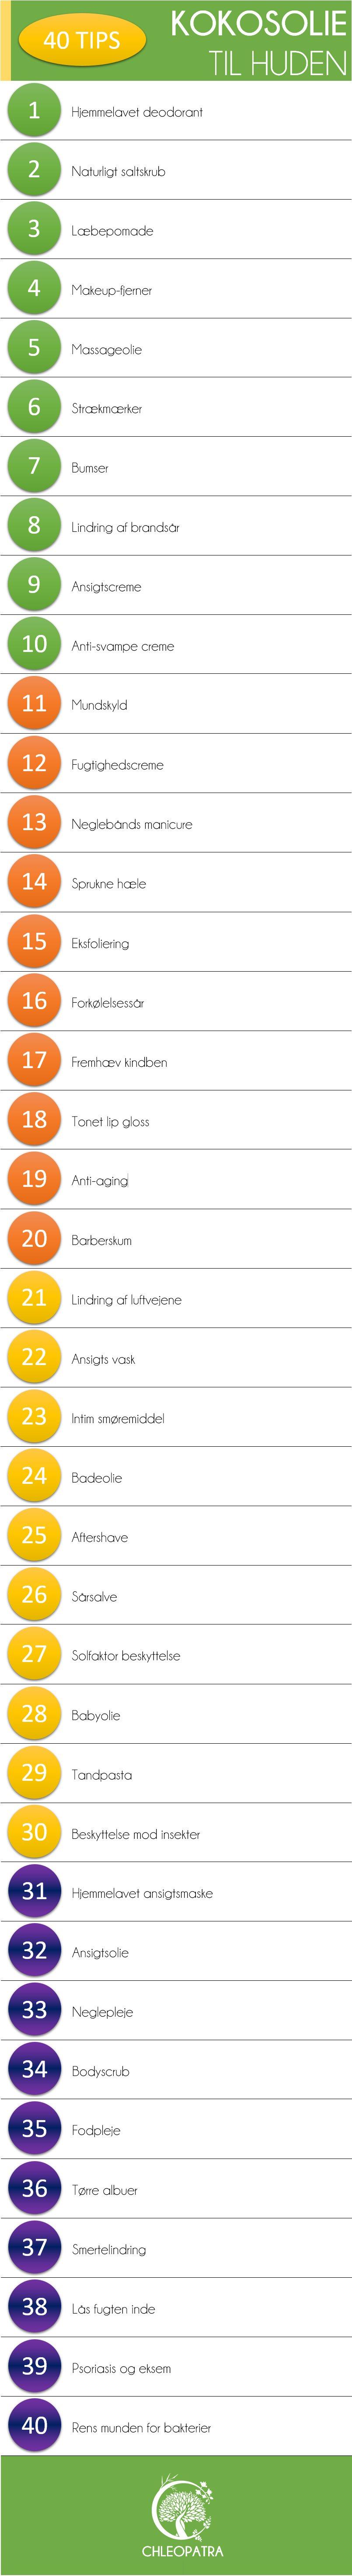 infografik - kokosolie til huden